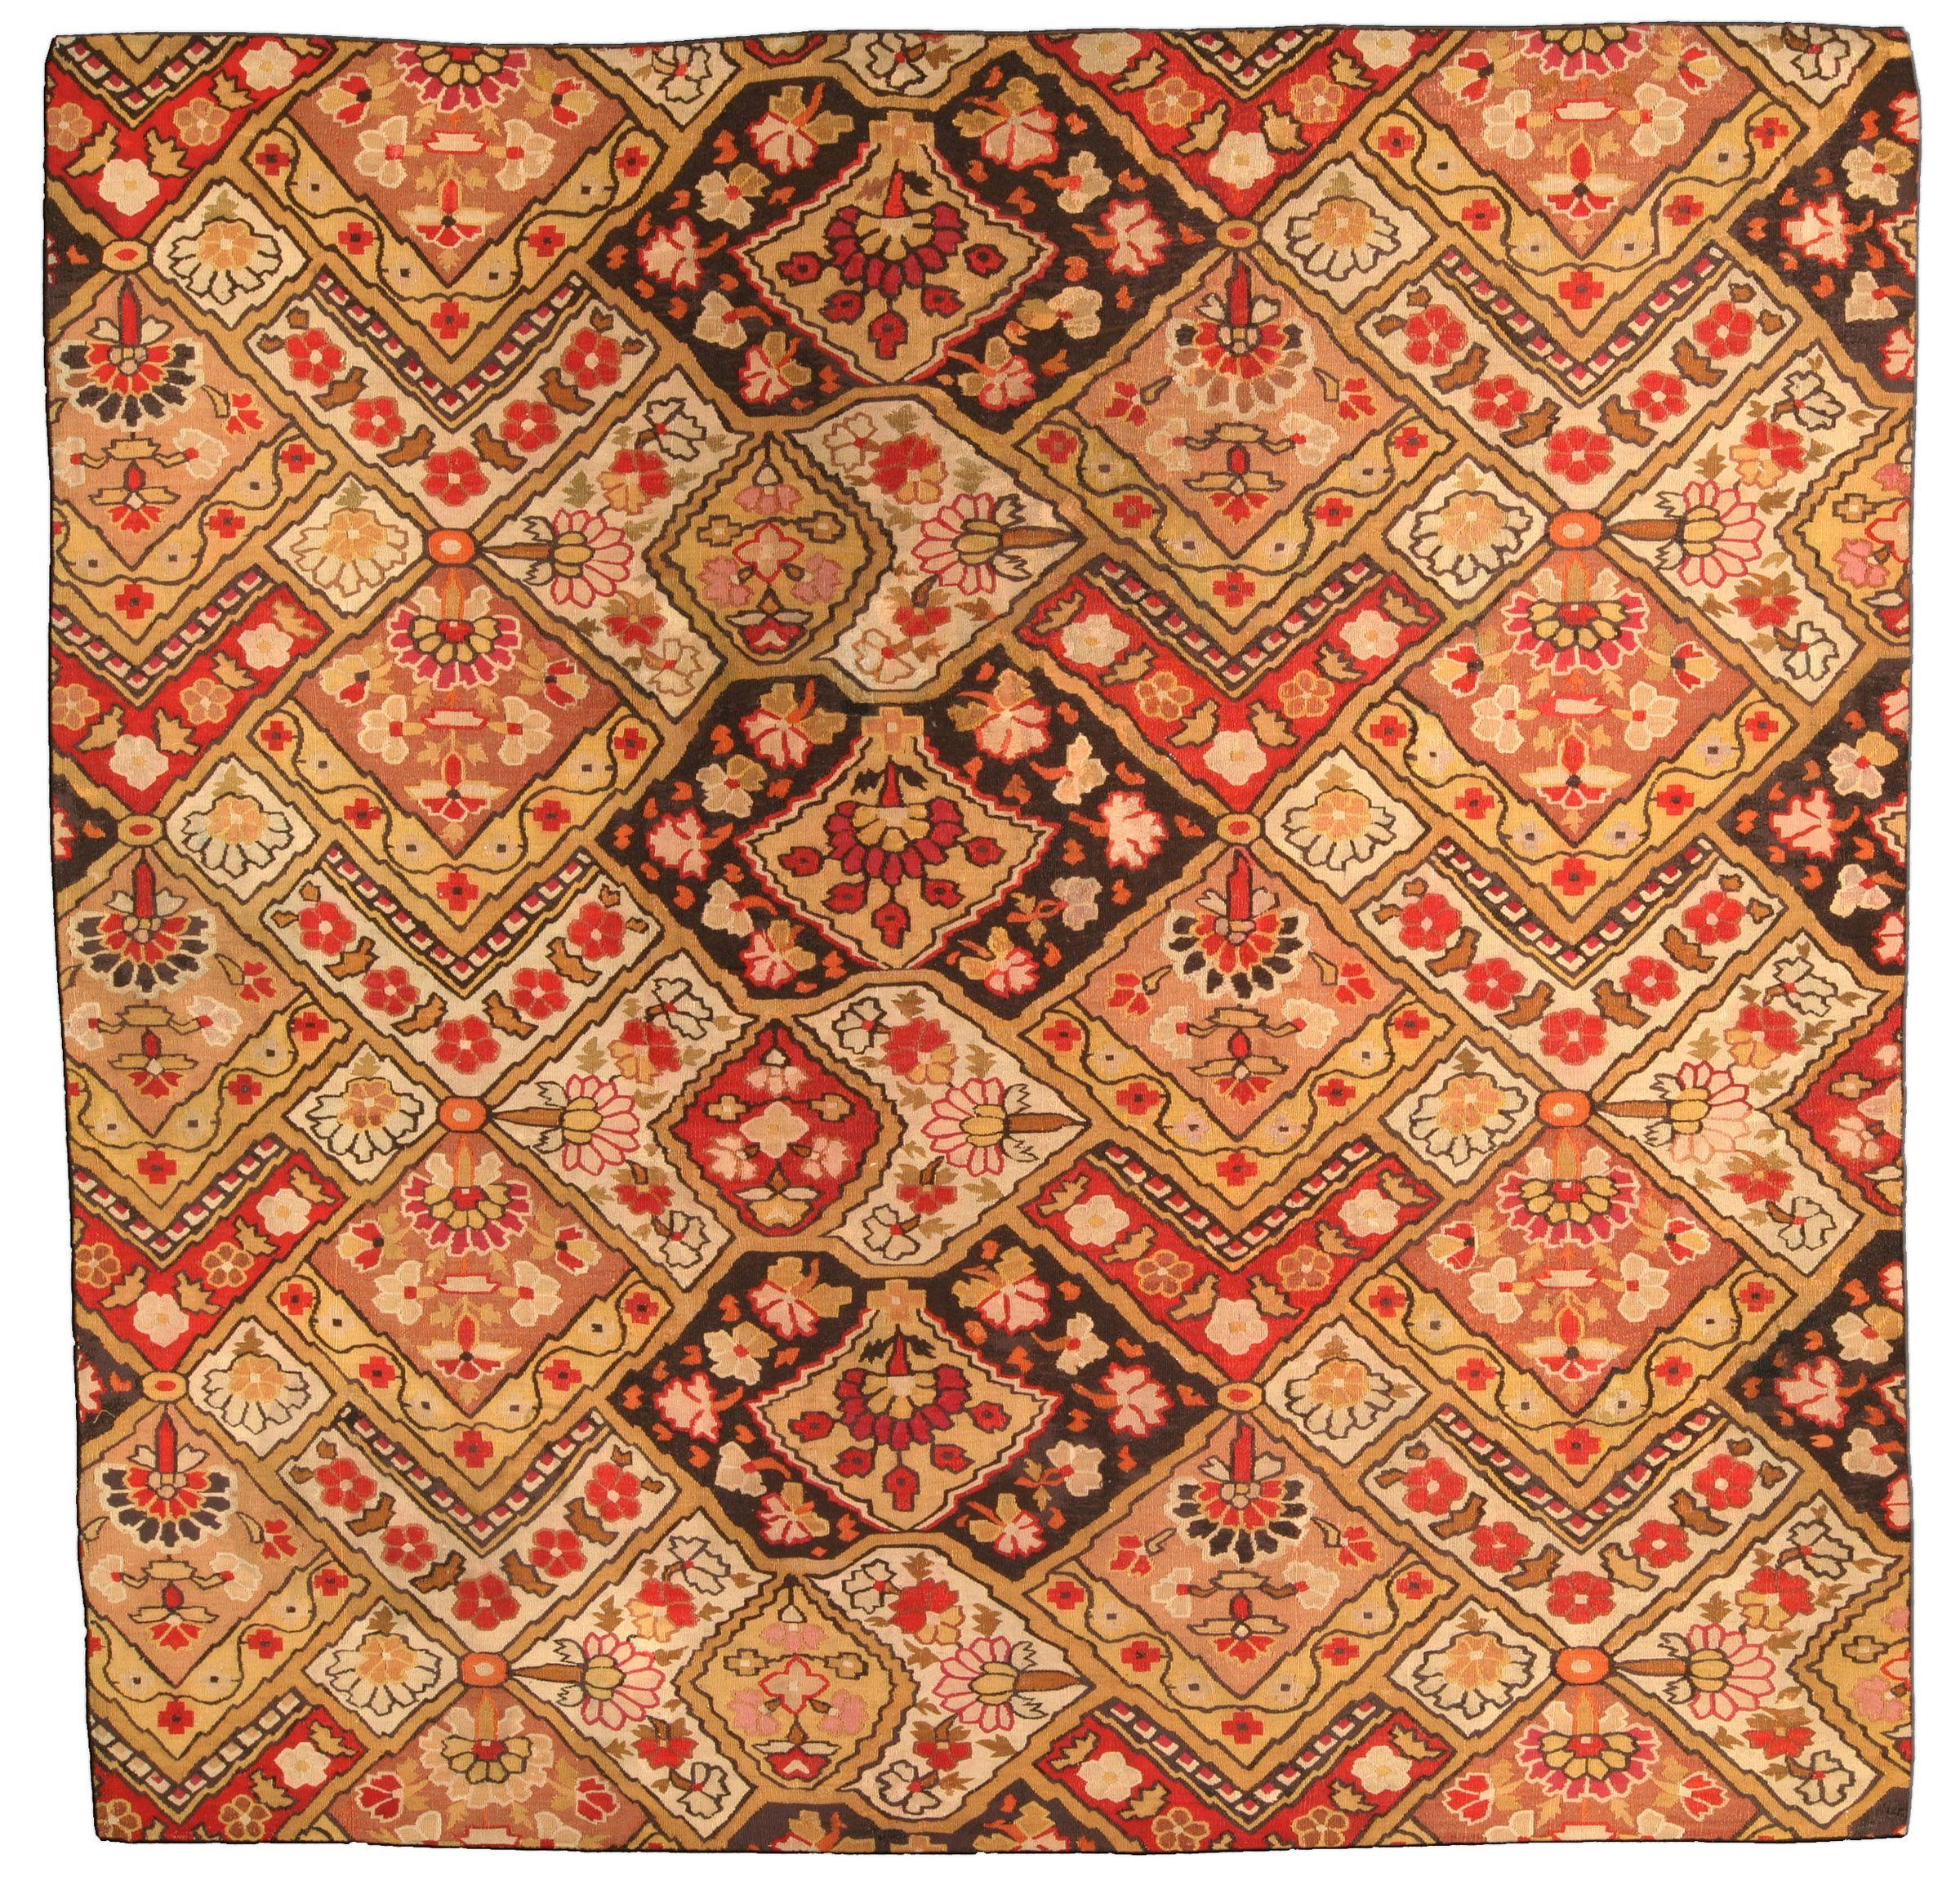 A European Antique Rug